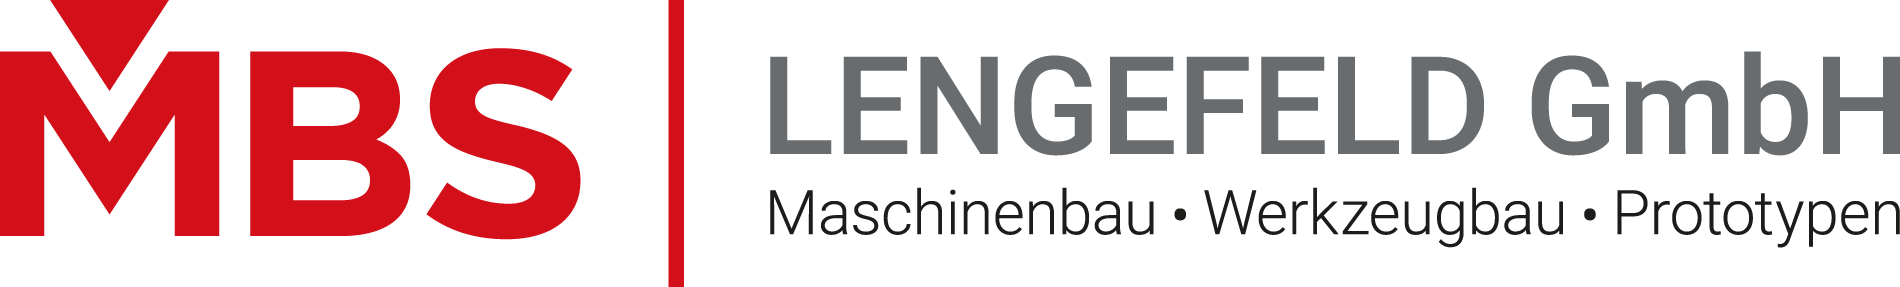 MBS GmbH